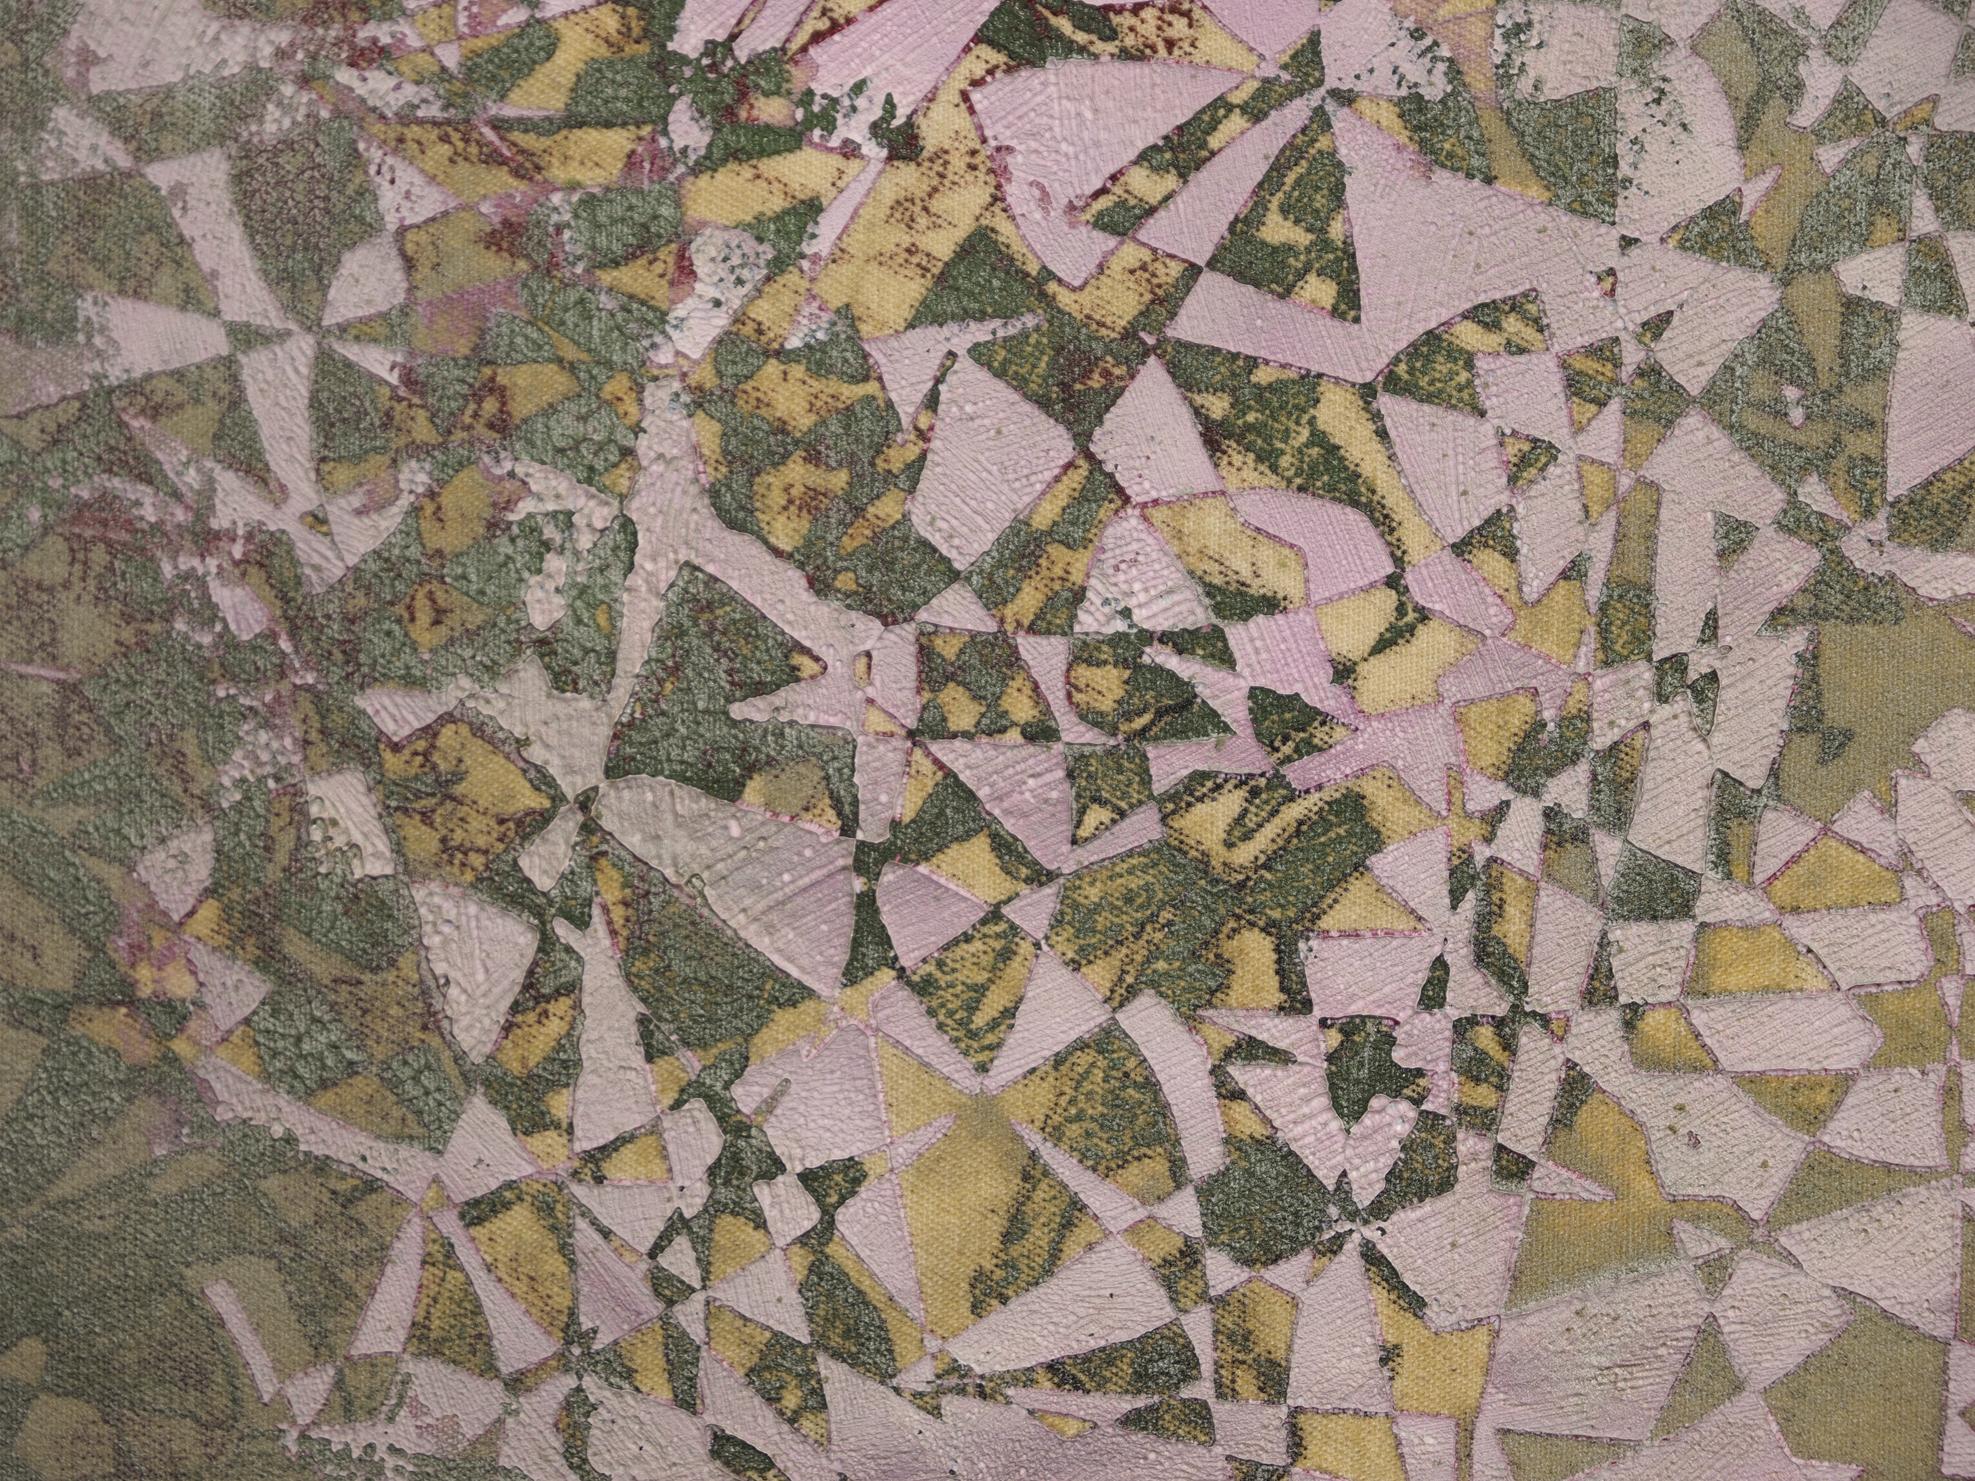 """Ornamental Jeff Koons"", 2014, Detail, Öl auf Leinwand, 100x200 cm"